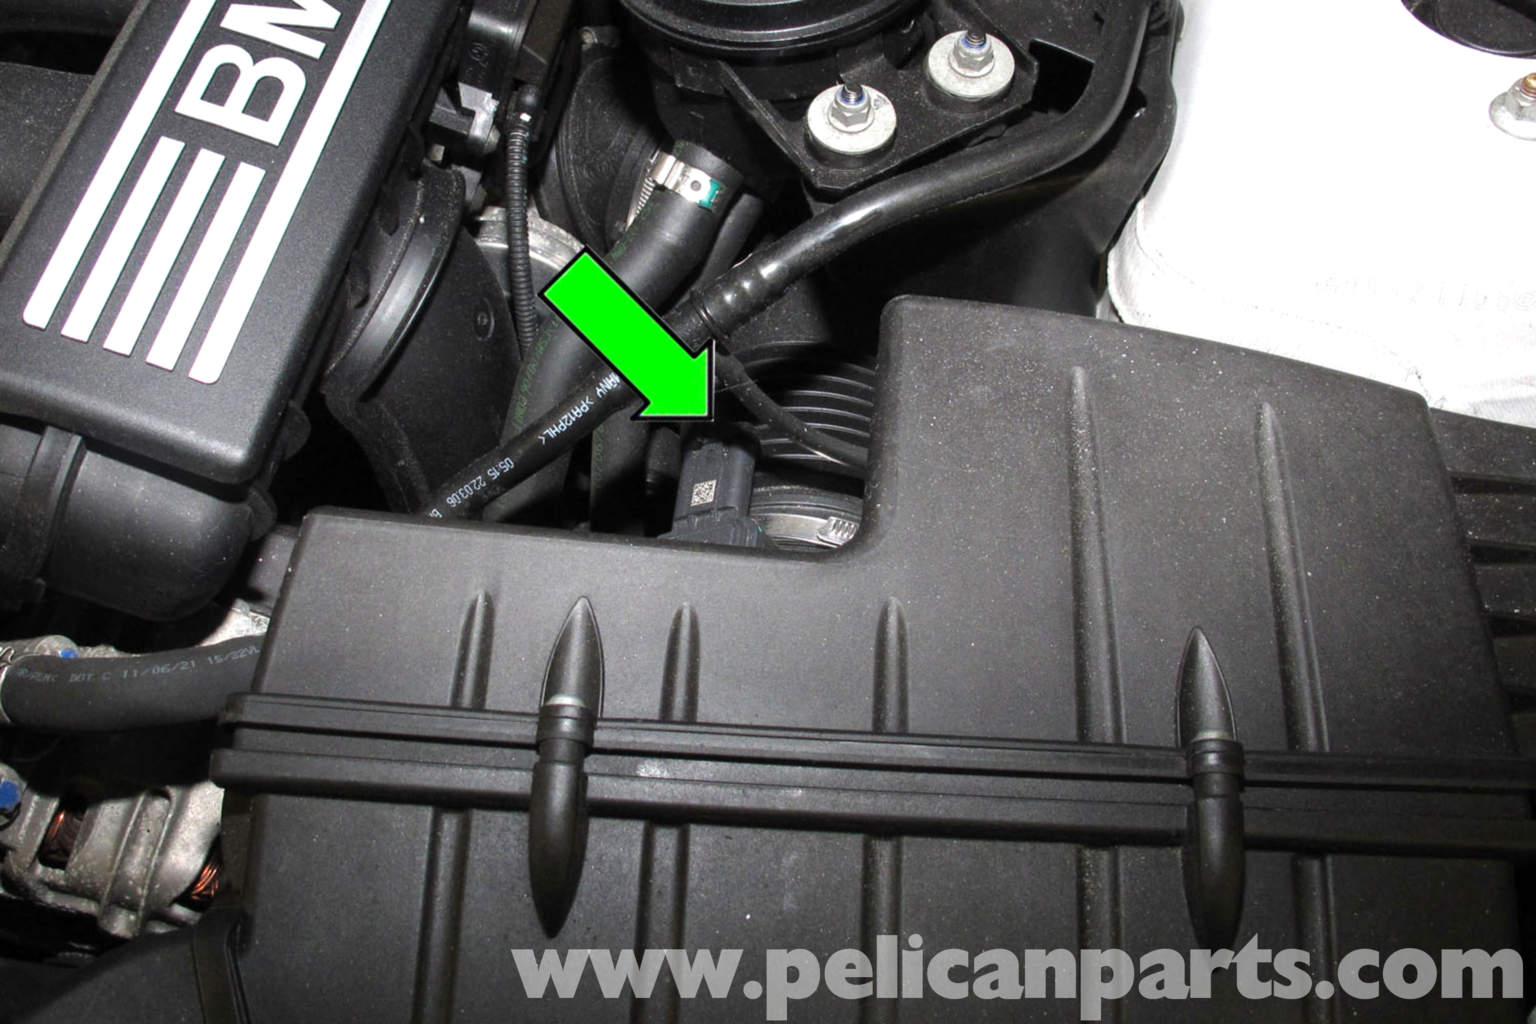 Bmw E90 Throttle Body Replacement E91 E92 E93 Pelican Parts Small Engine Light Diagram Large Image